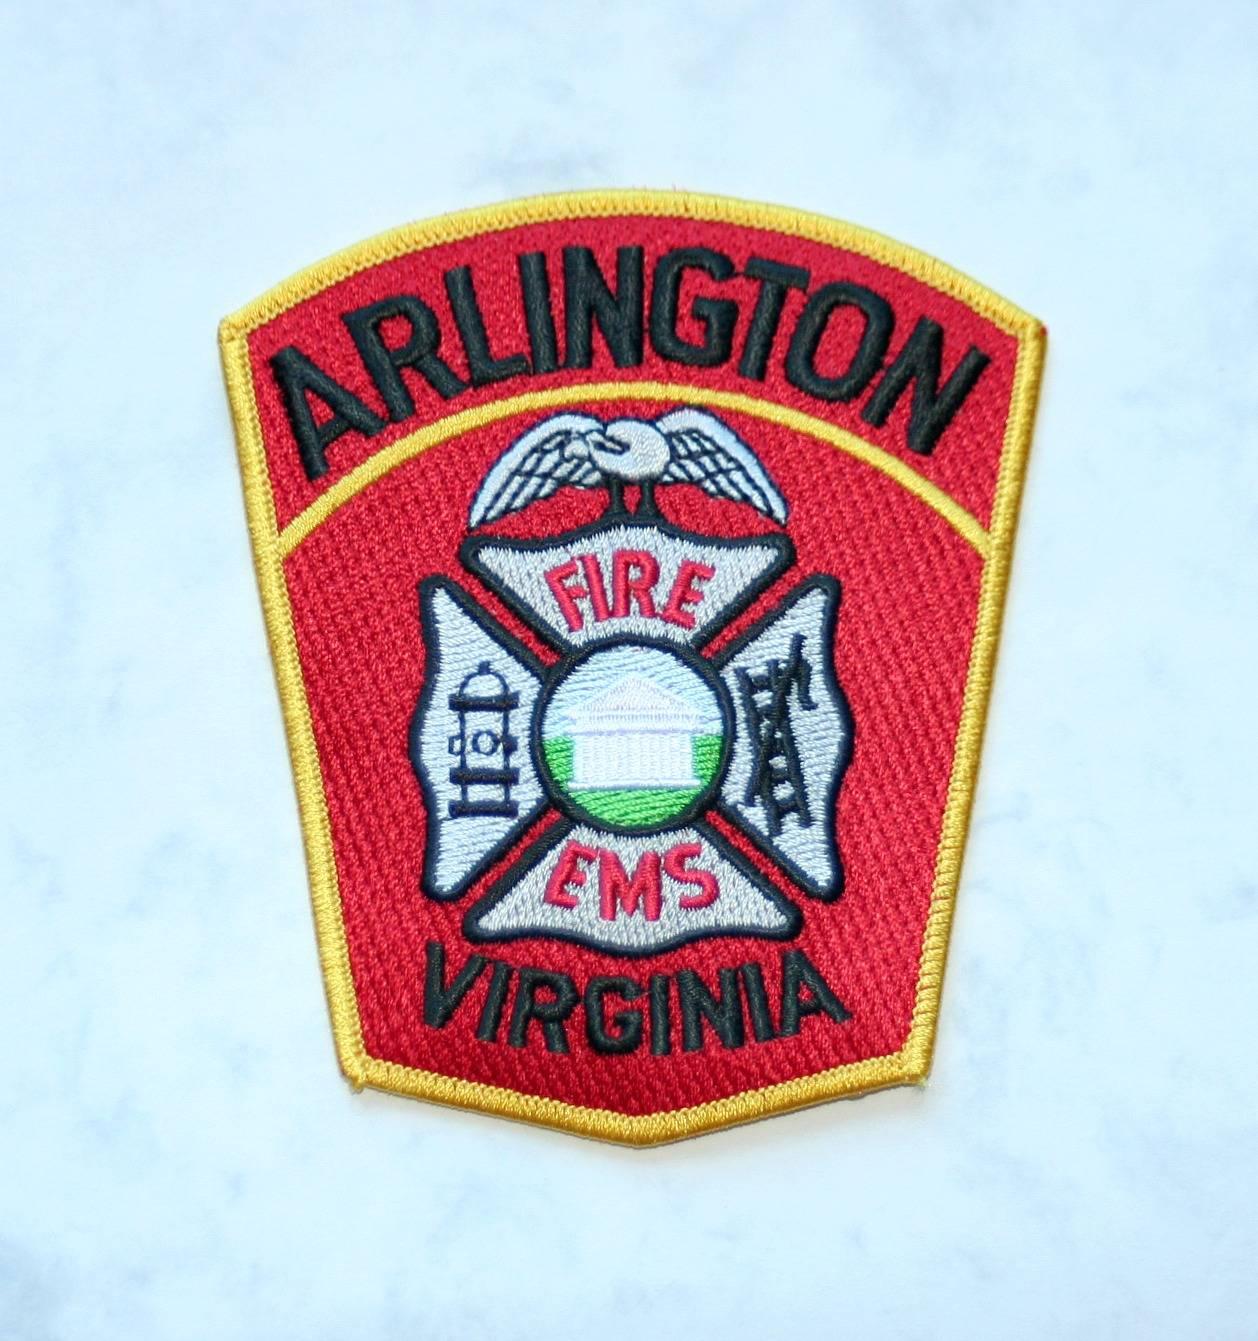 Arlington Va. Fire